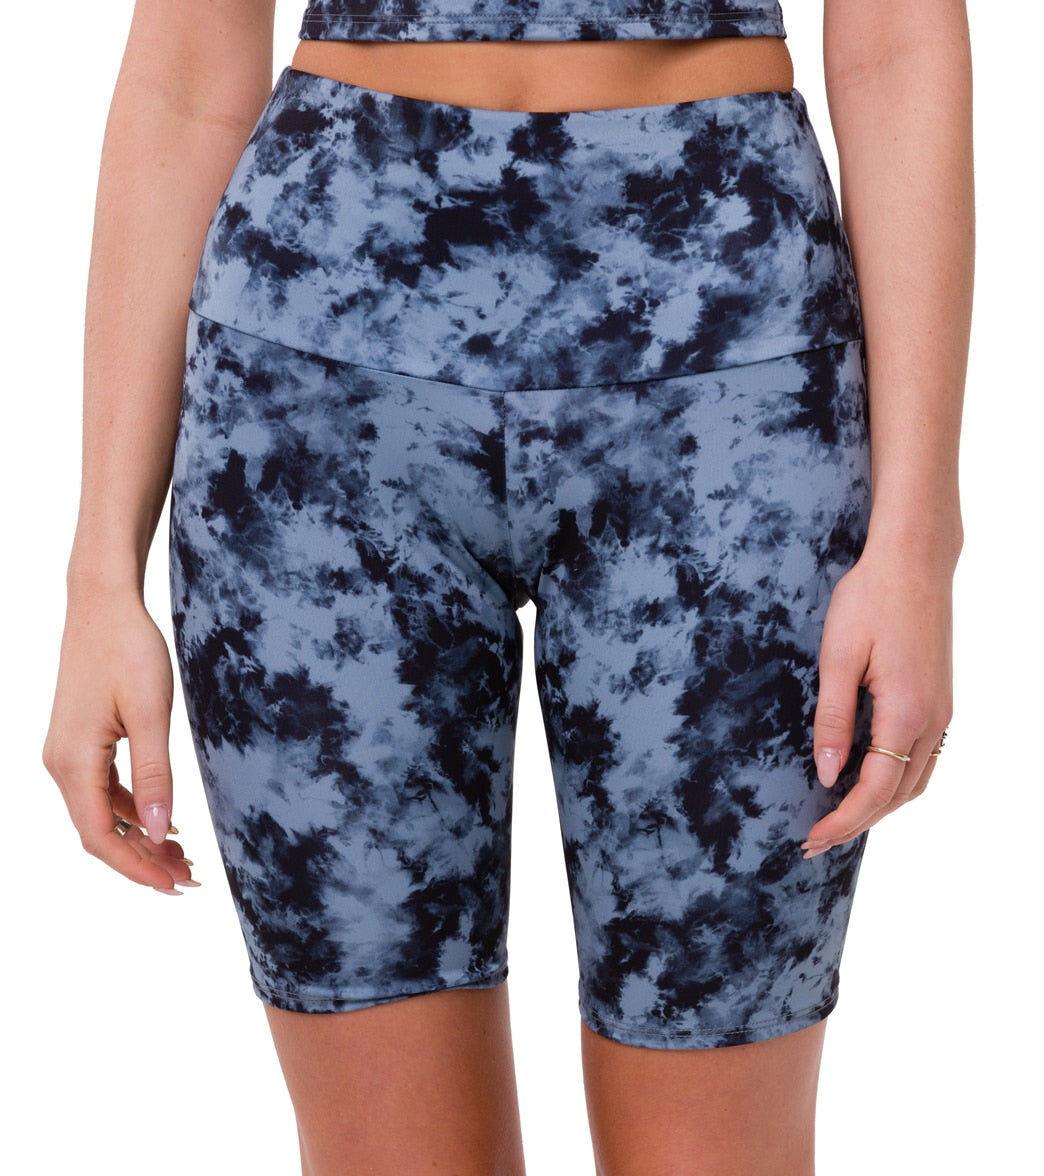 Onzie Women's High Rise Bike Shorts - Wash Moonstone Acid ML Spandex